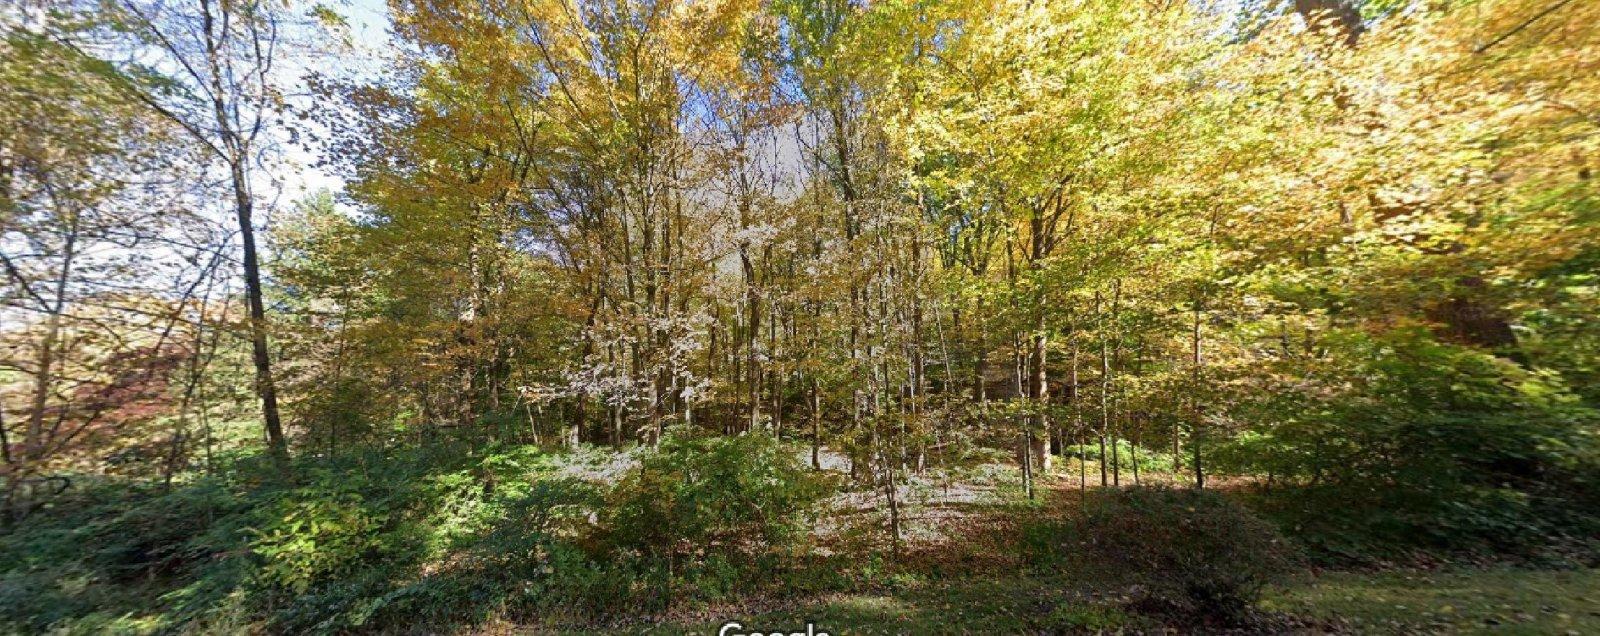 Hosner Mountain Rd Stormville, NY Main 6 www.WeSellNewYorkLand.com